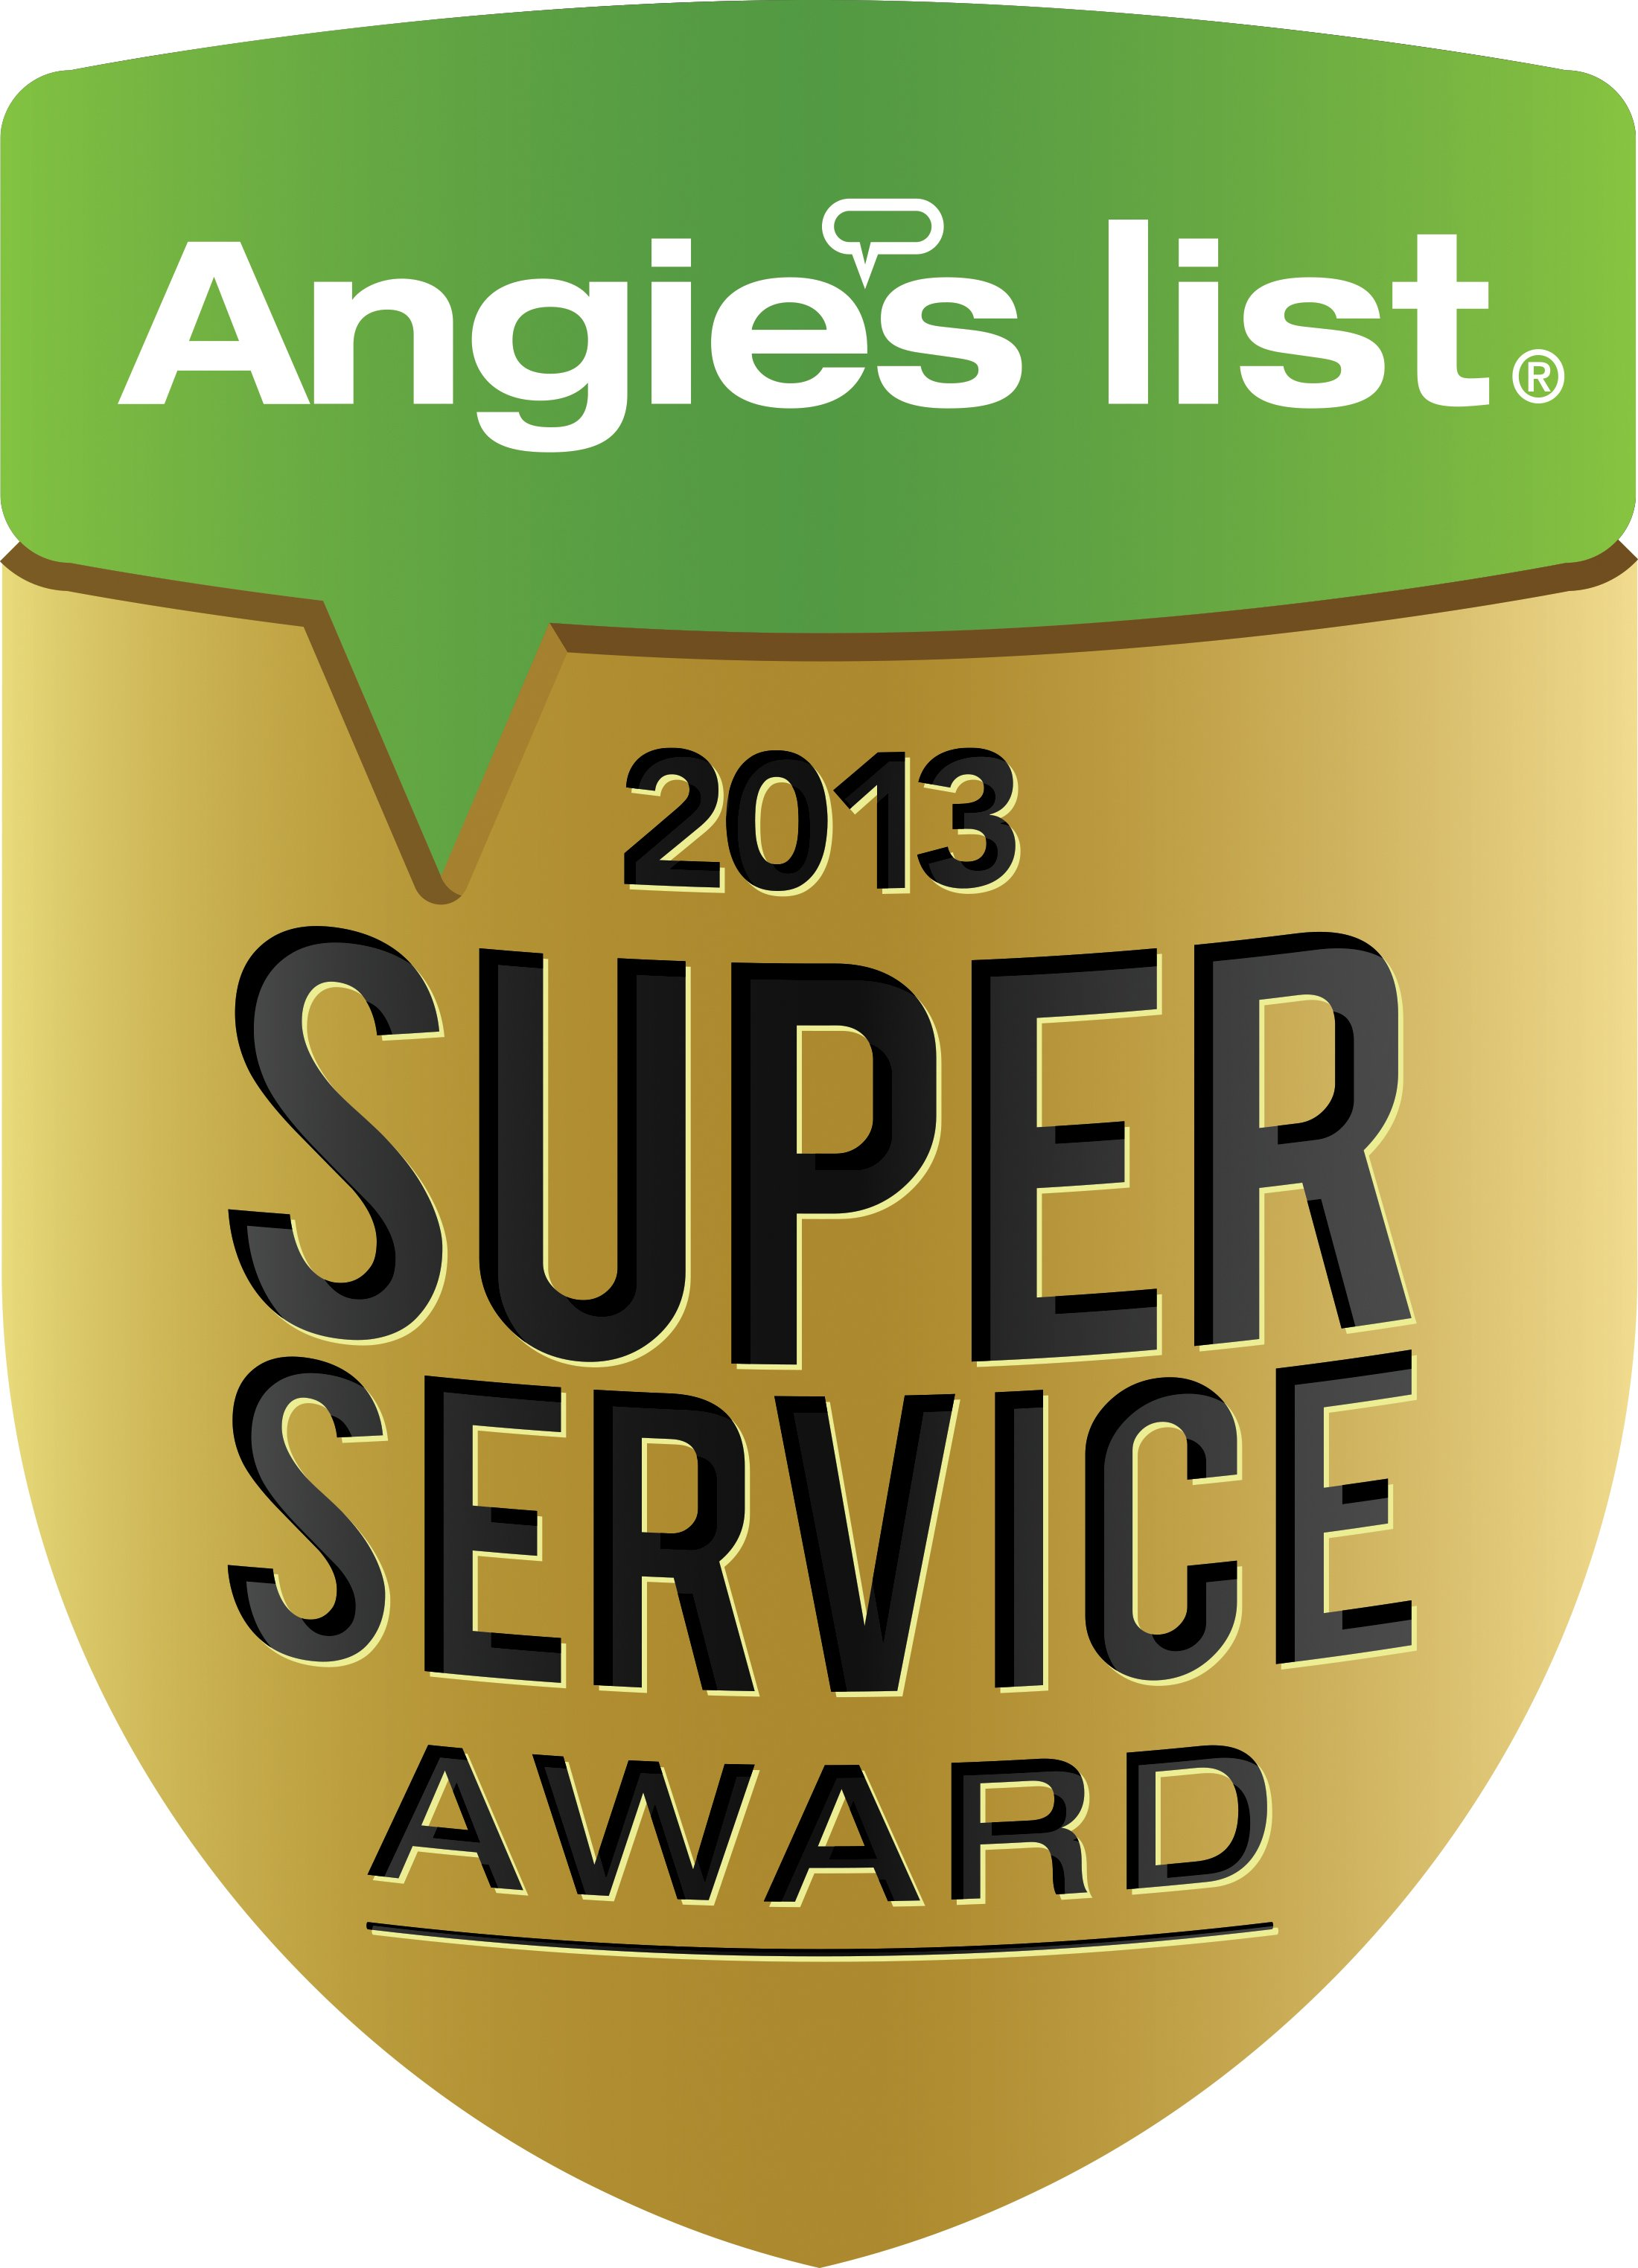 Angies list super service award||||